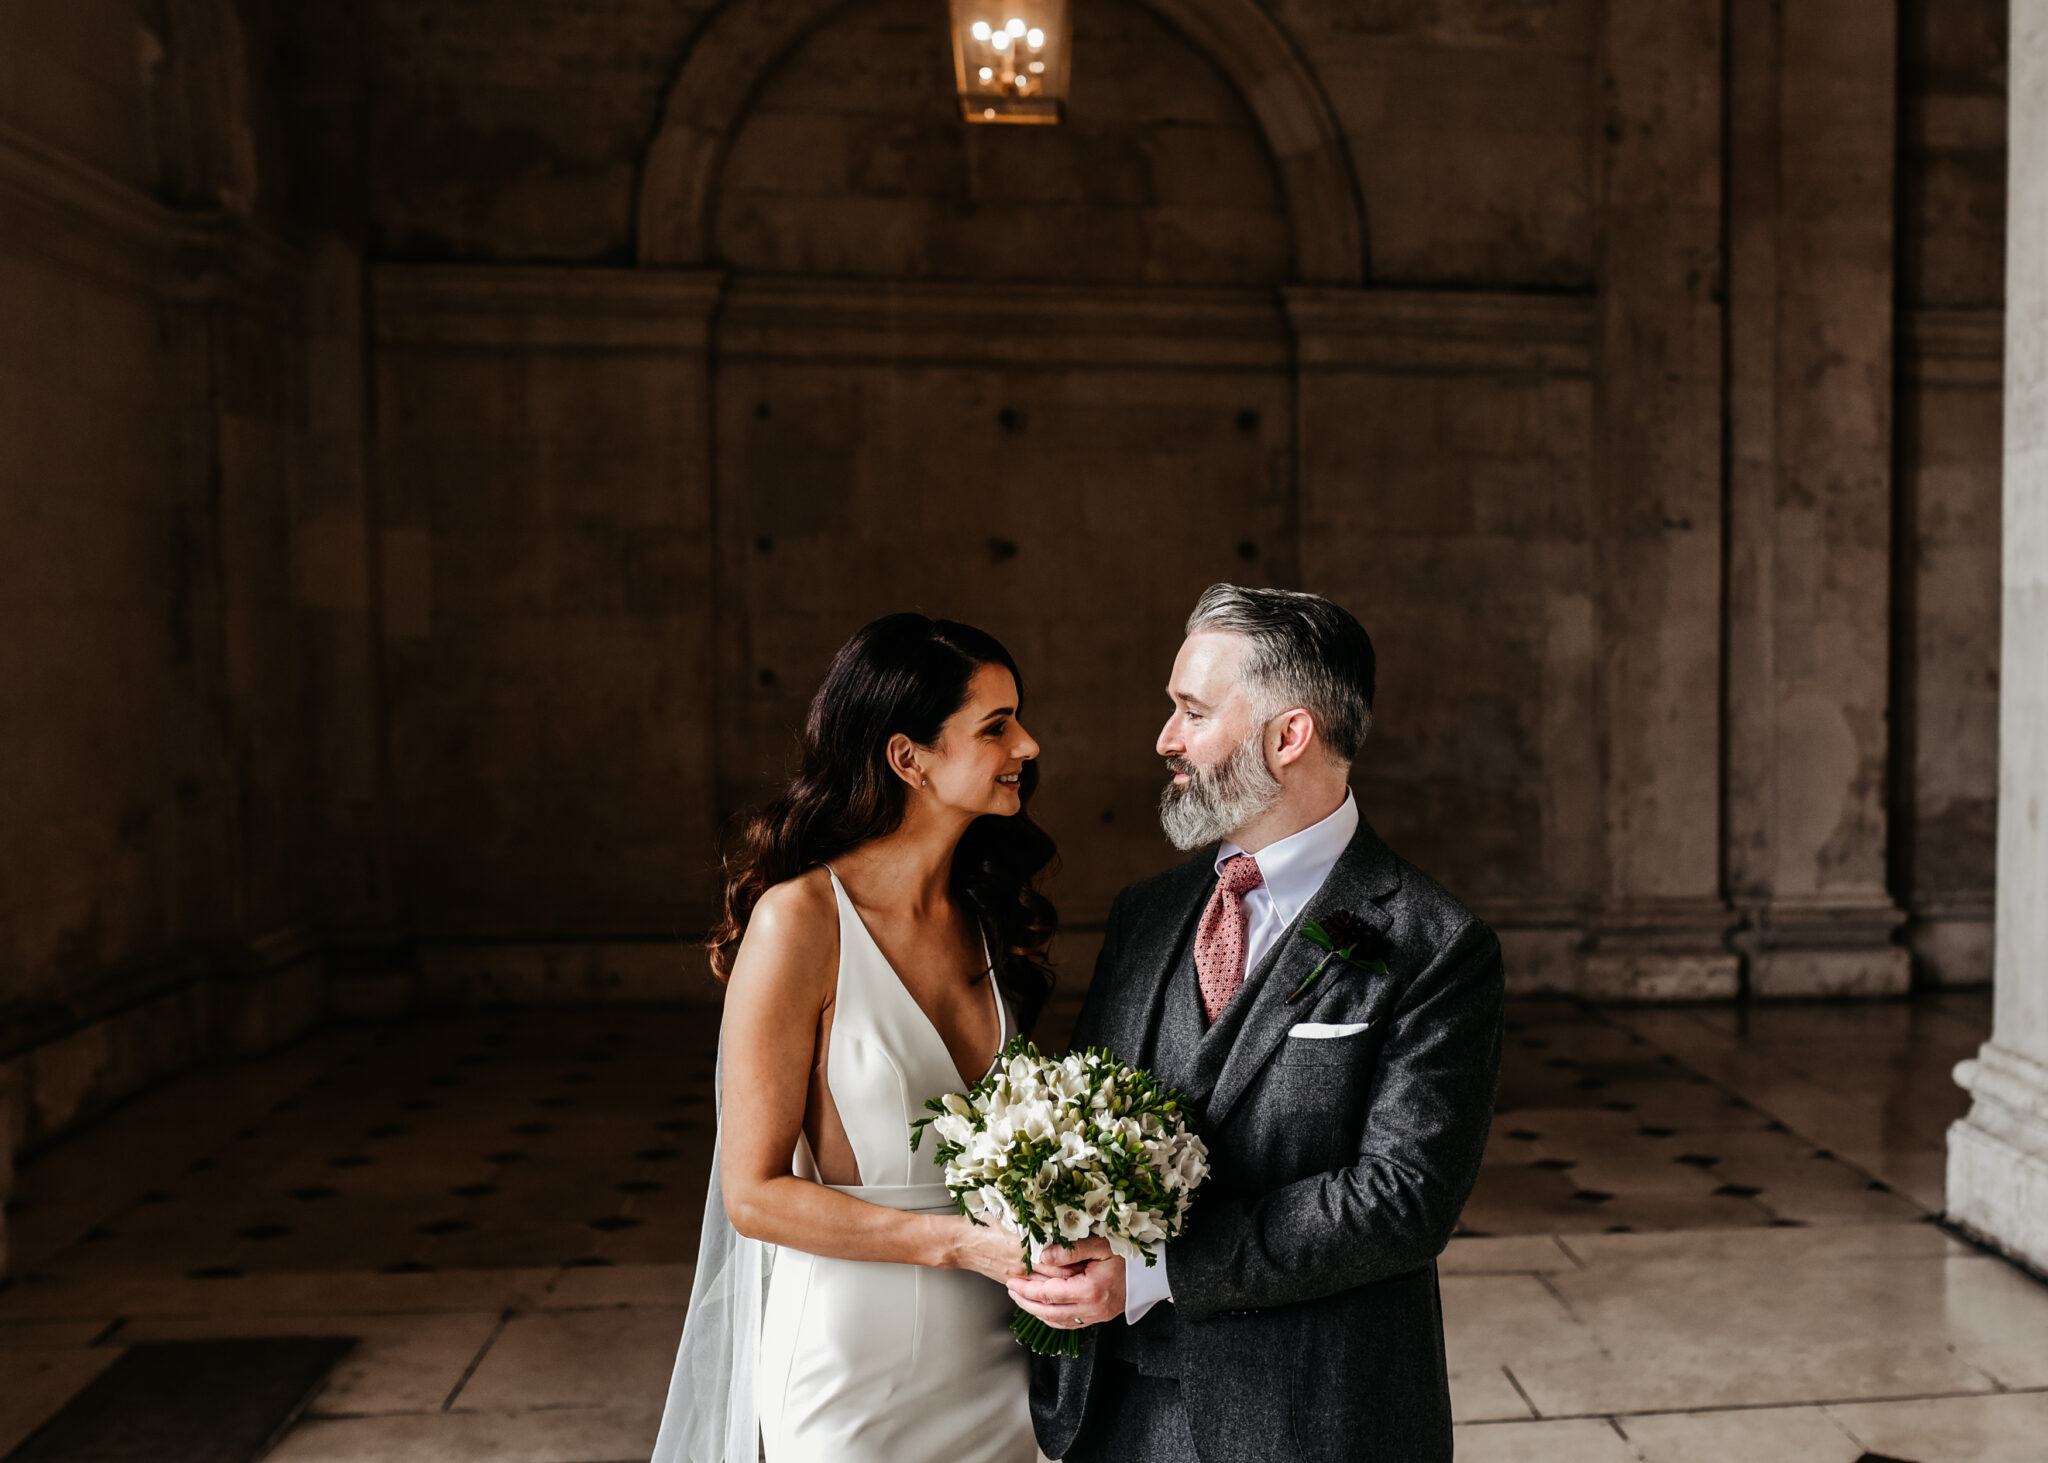 City Hall Wedding Photos Intercontinental Hotel Dublin 23